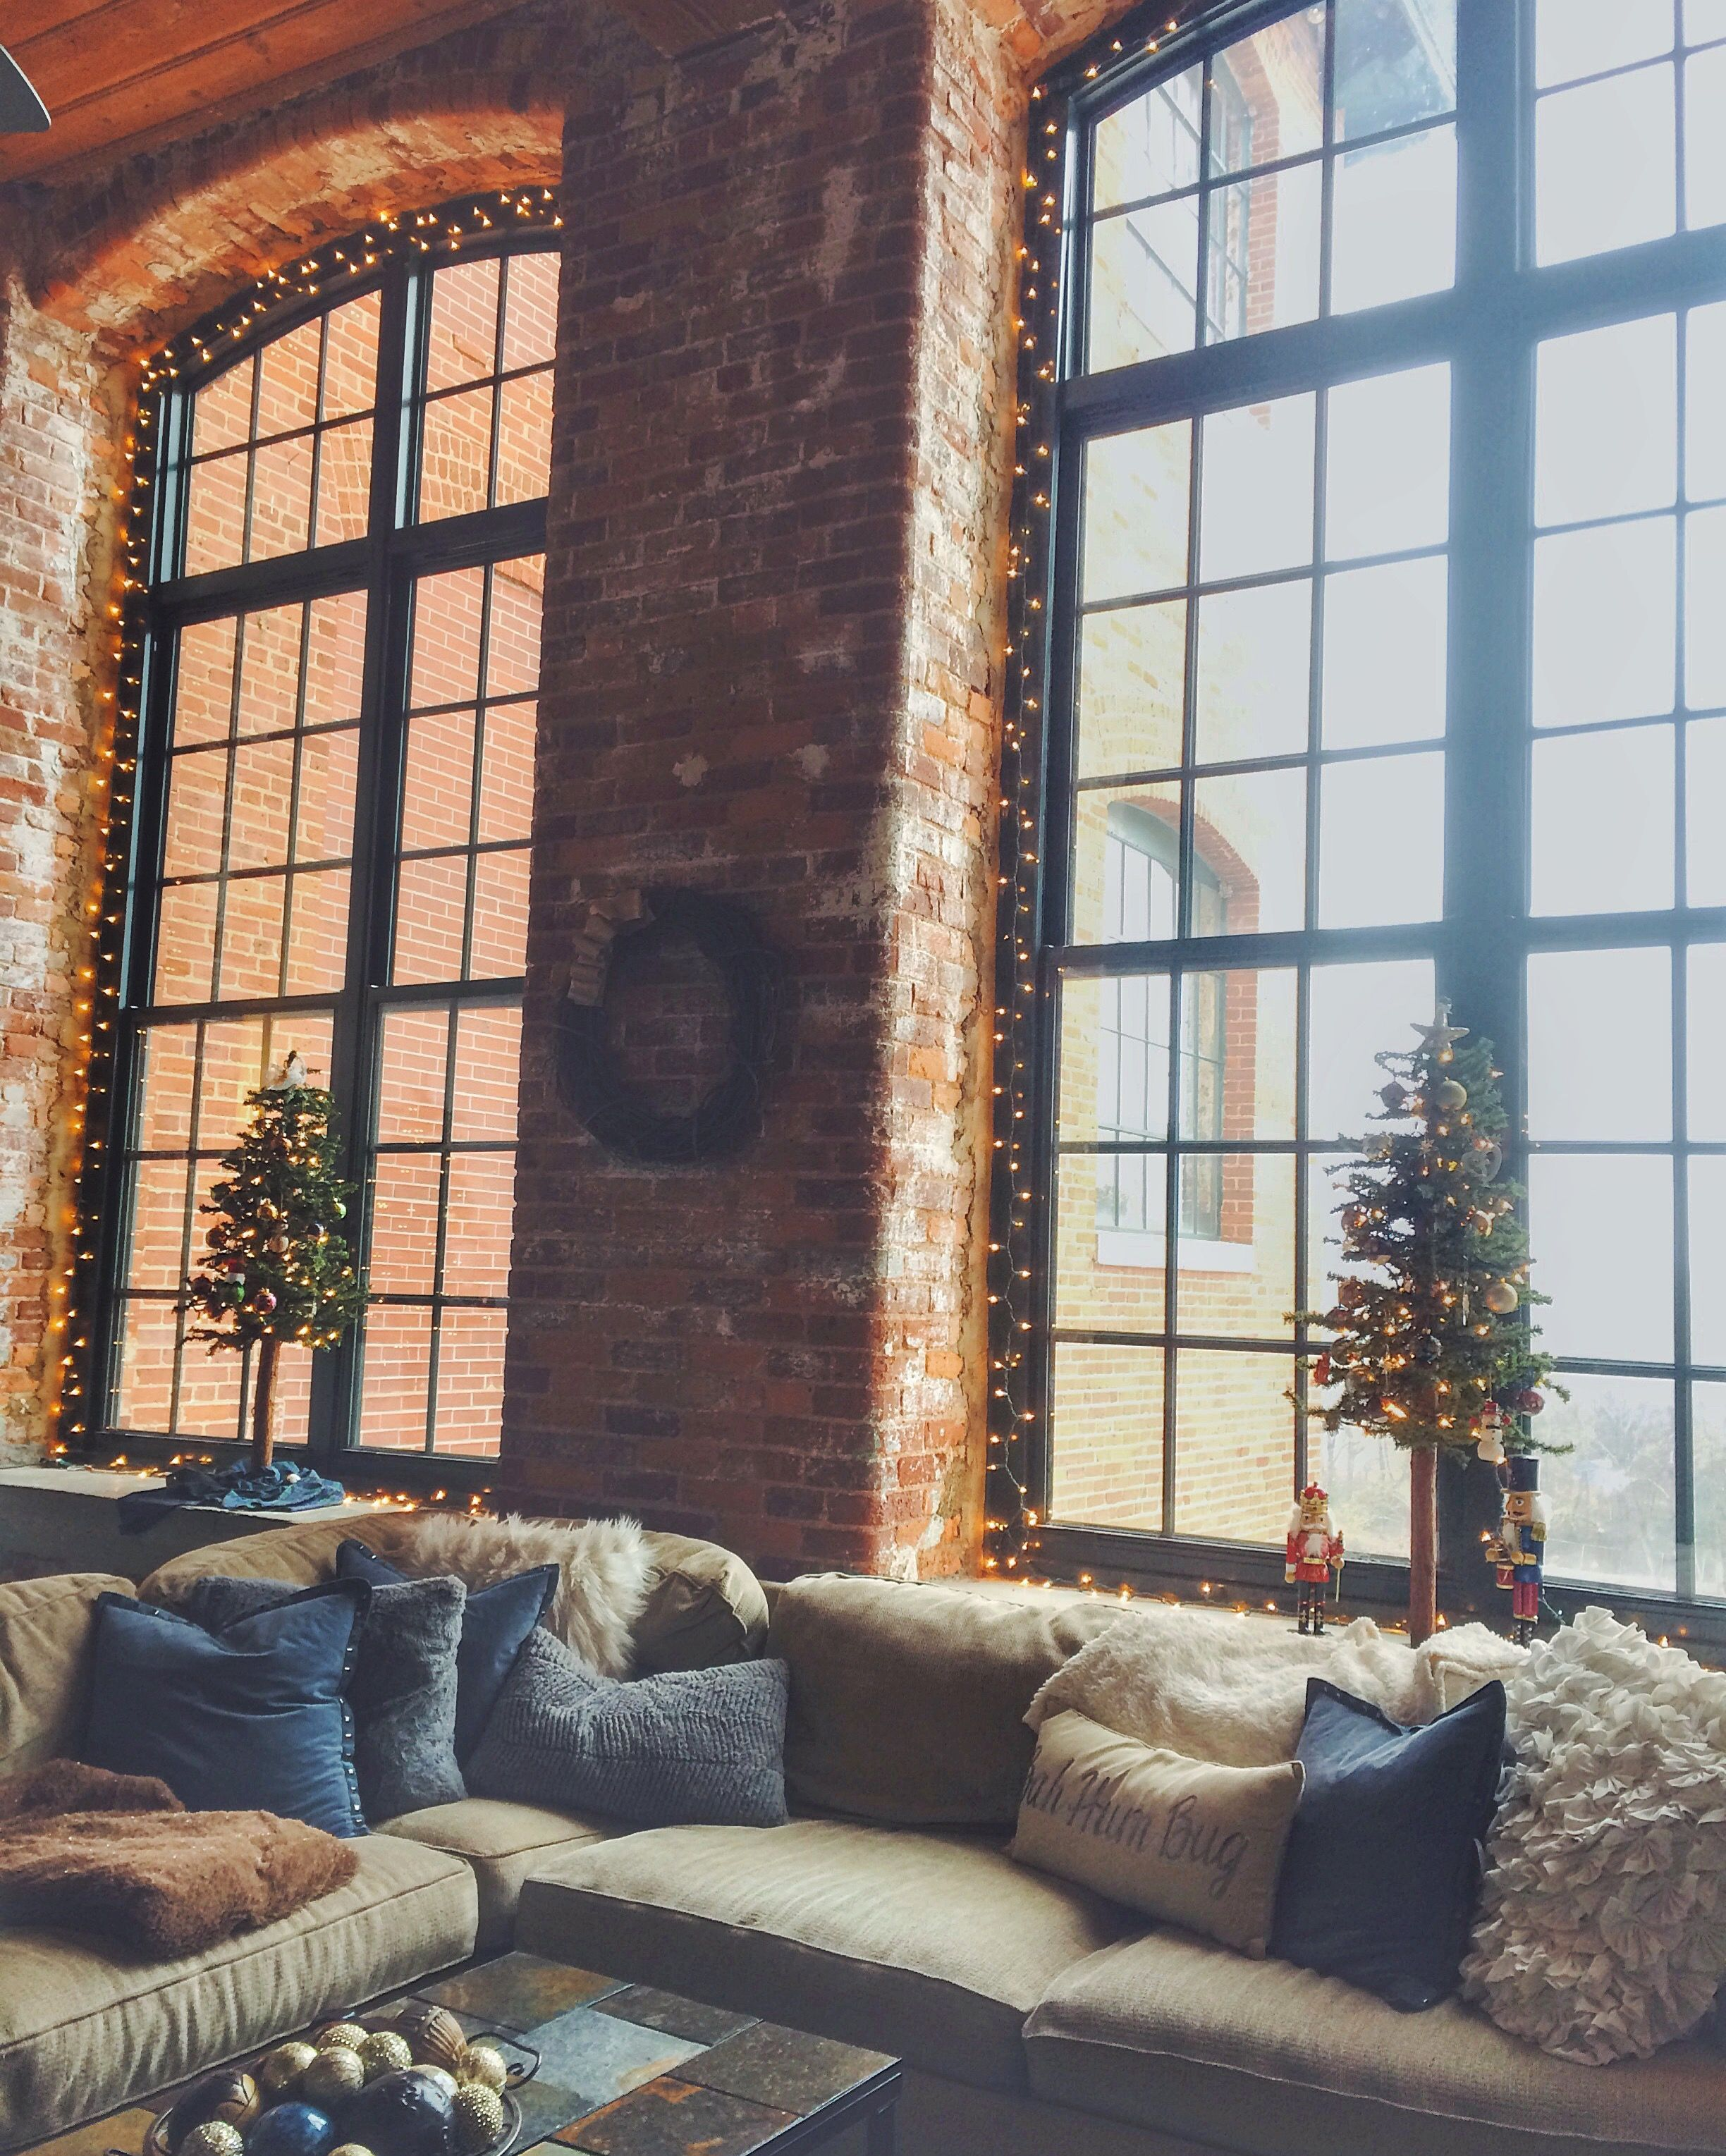 Cozy loft style apartment christmas decor Exposed brick wall